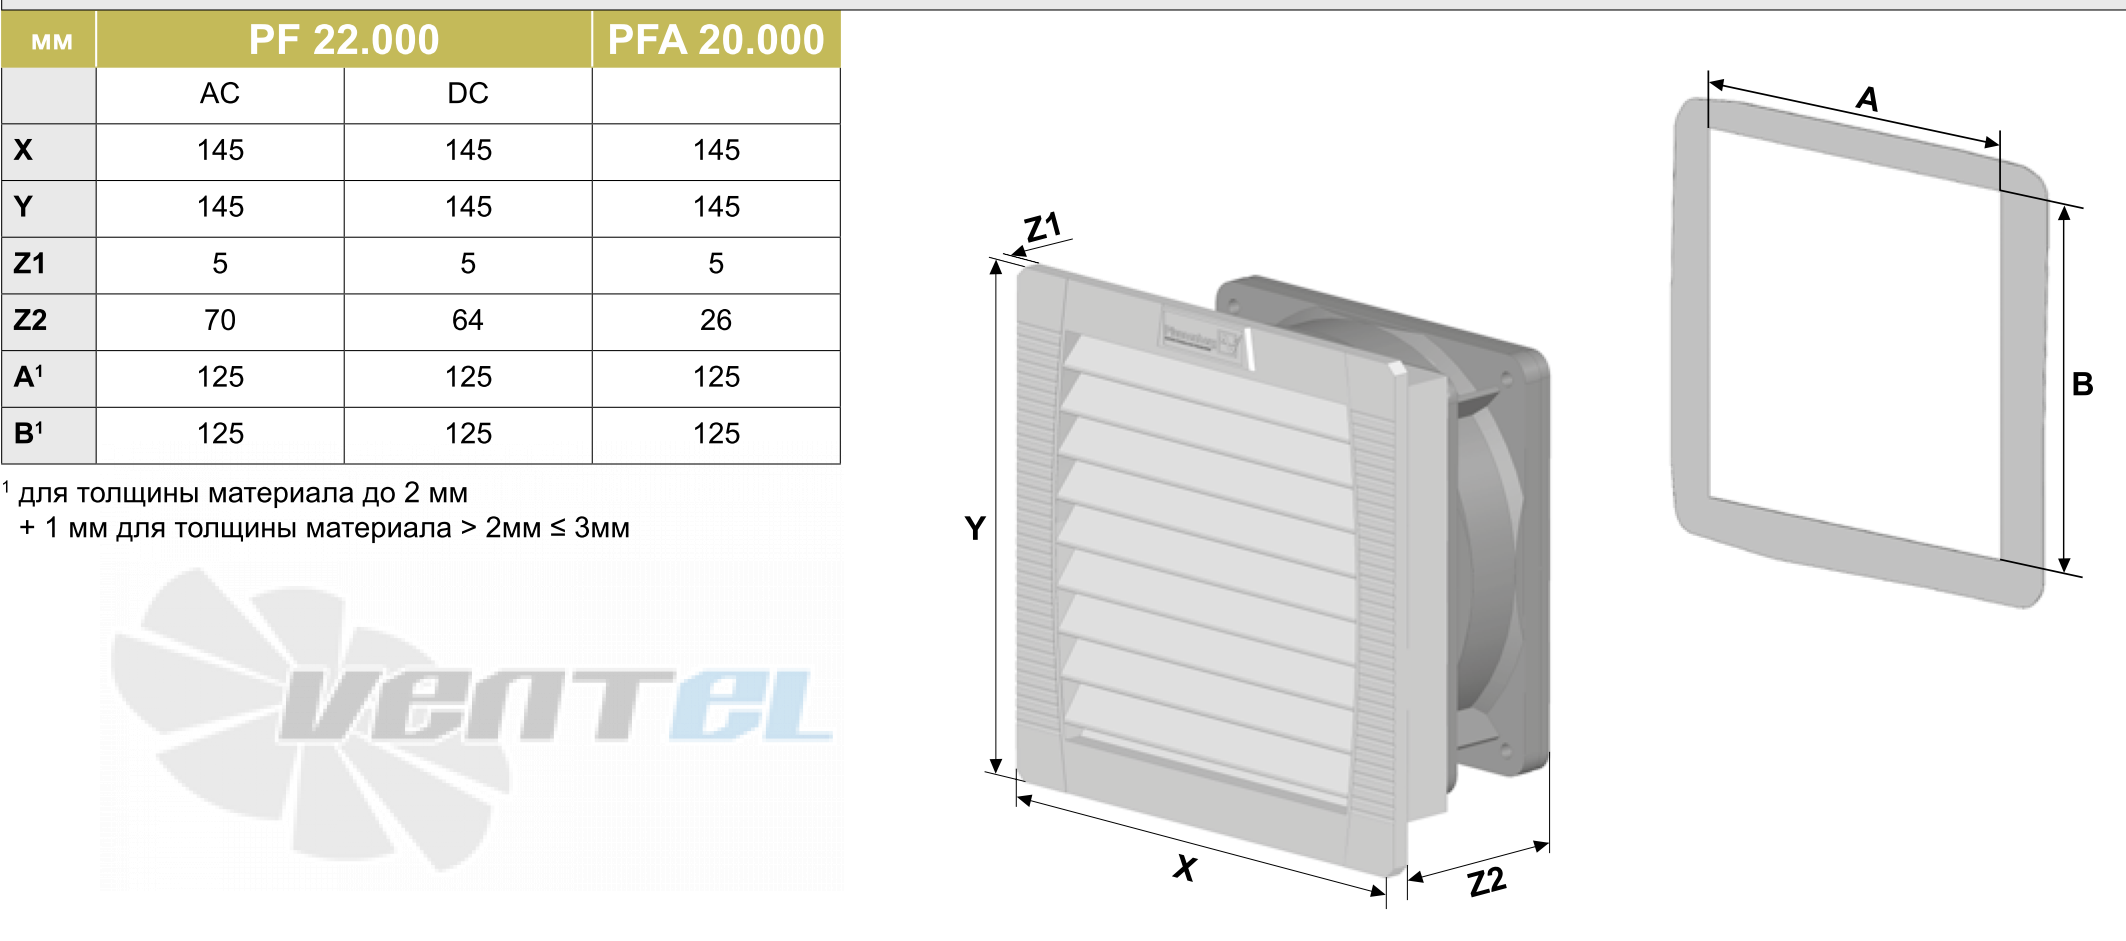 Габаритные размеры Pfannenberg PF 22.000 IP54